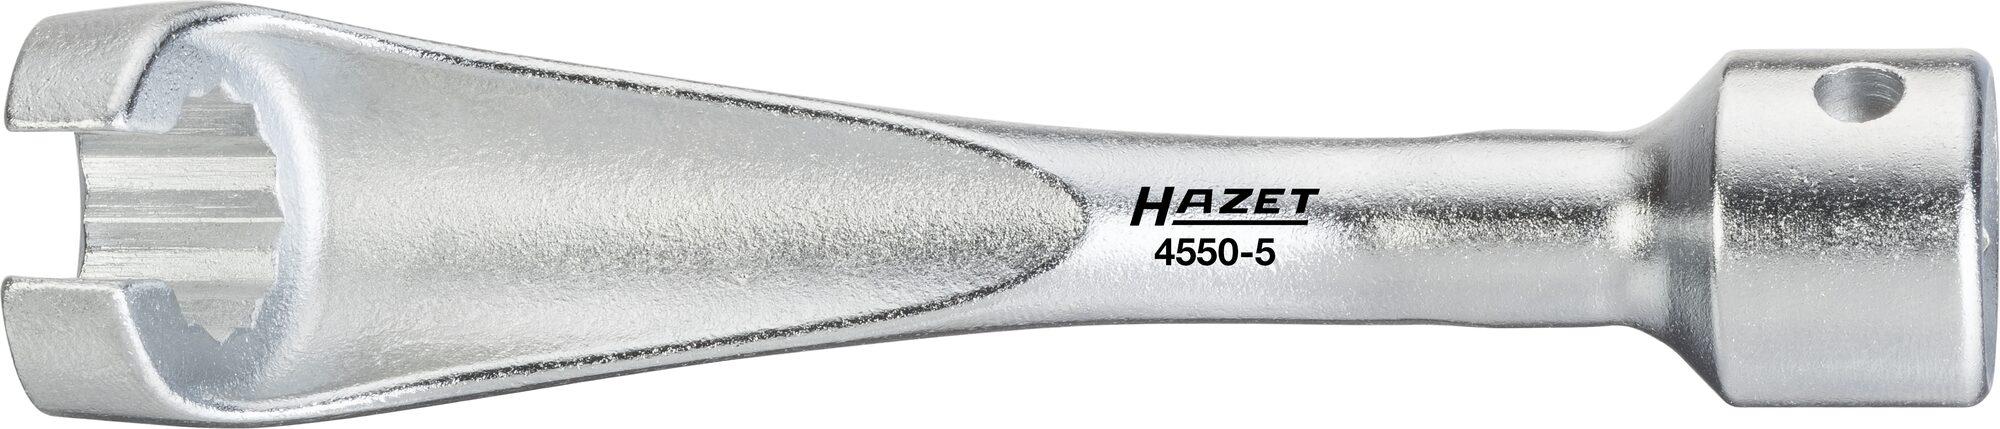 HAZET Einspritzleitungs-Schlüssel 4550-5 ∙ Vierkant hohl 12,5 mm (1/2 Zoll) ∙ Außen-Doppel-Sechskant Profil ∙ 14 mm